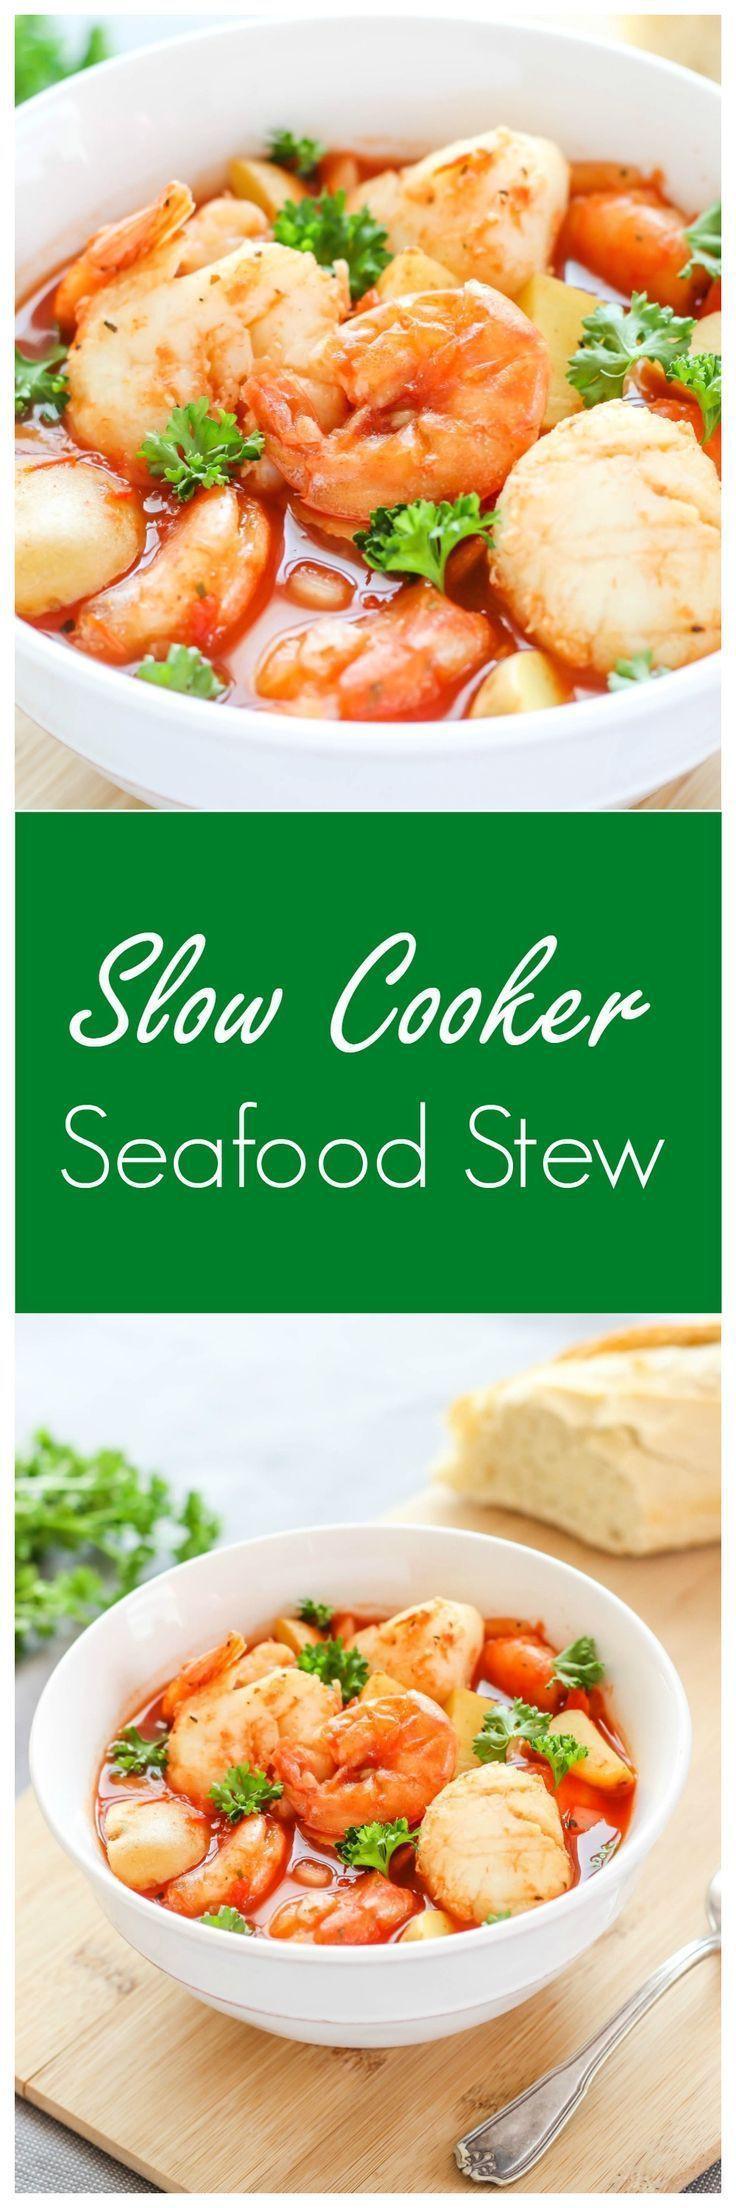 Slow Cooker Seafood Stew  Slow Cooker Seafood Stew Recipe